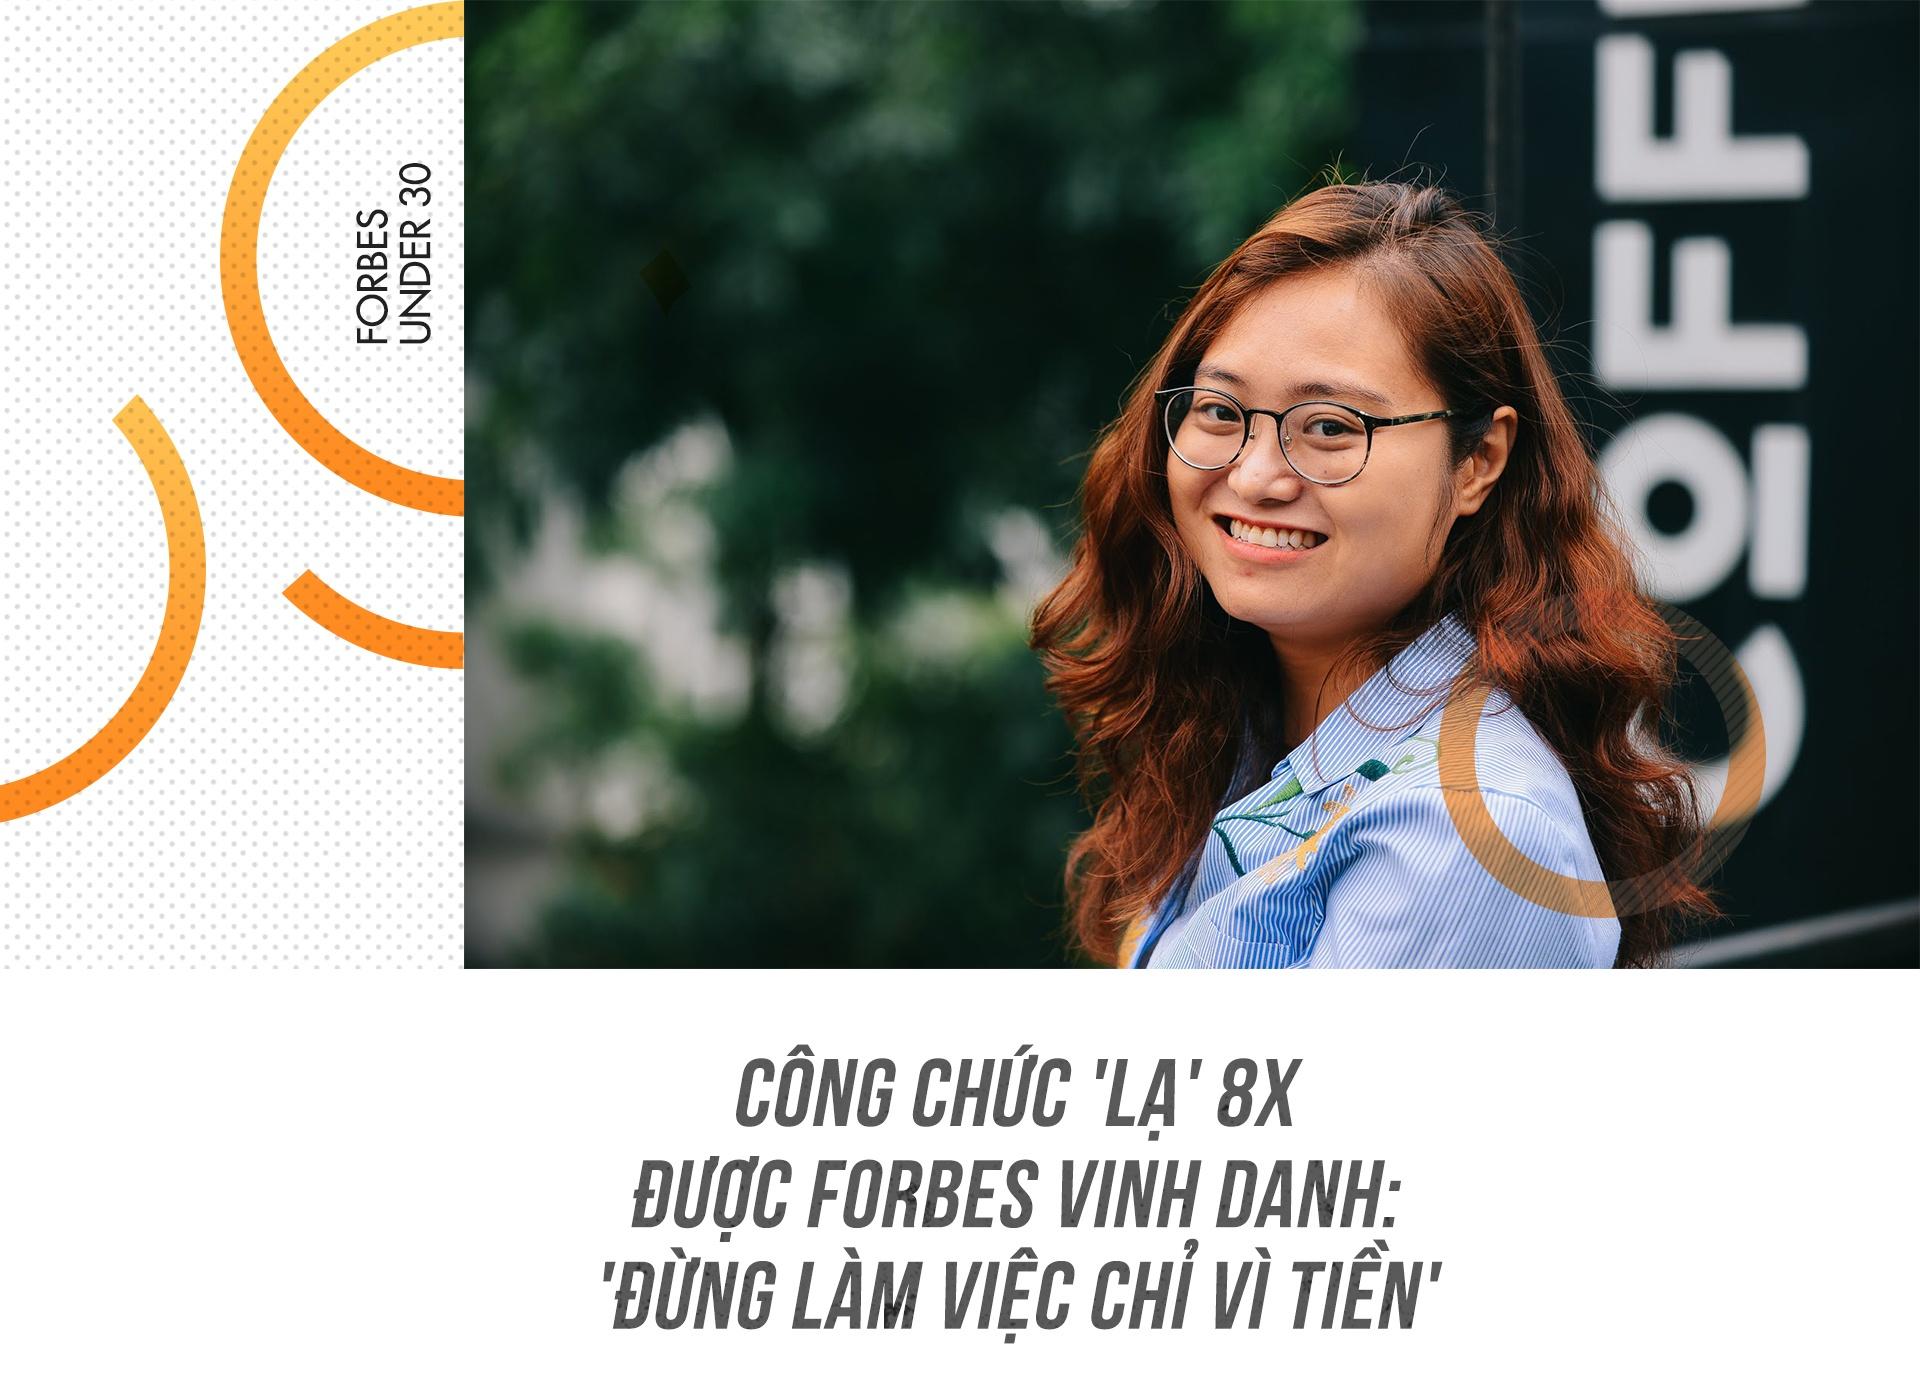 Cong chuc 'la' 8X duoc Forbes vinh danh: 'Dung lam viec chi vi tien' hinh anh 2